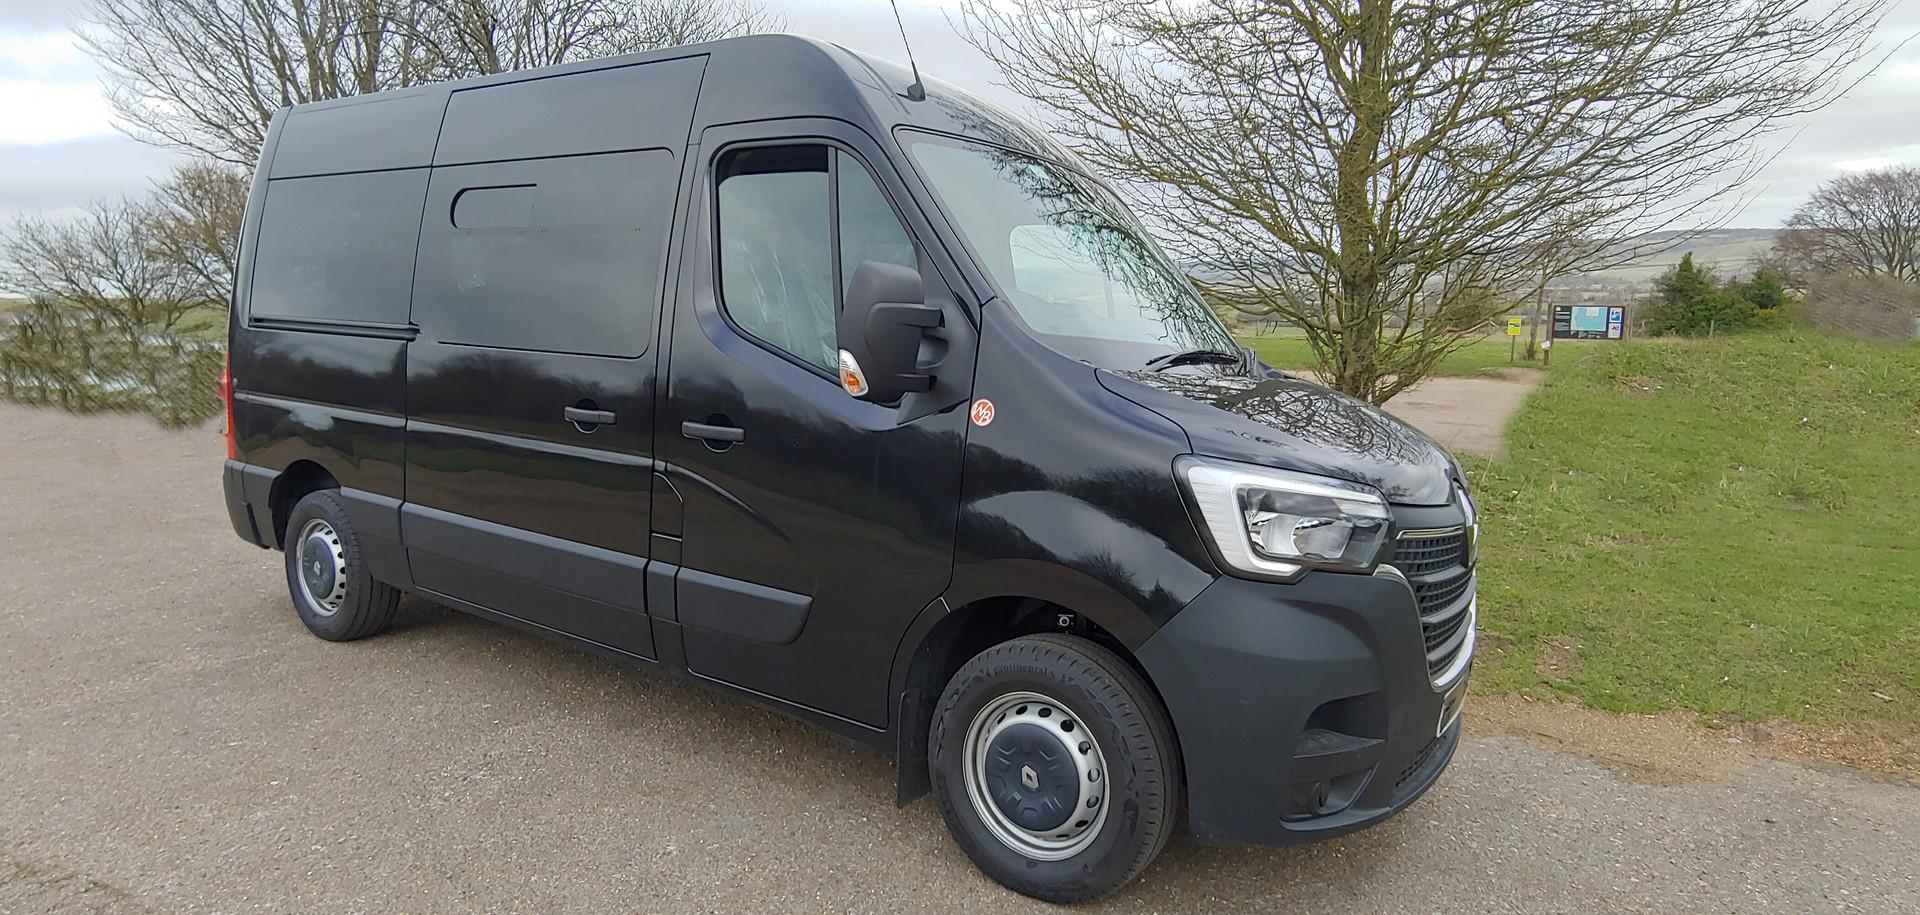 Renault Master Converted by Warnerbus